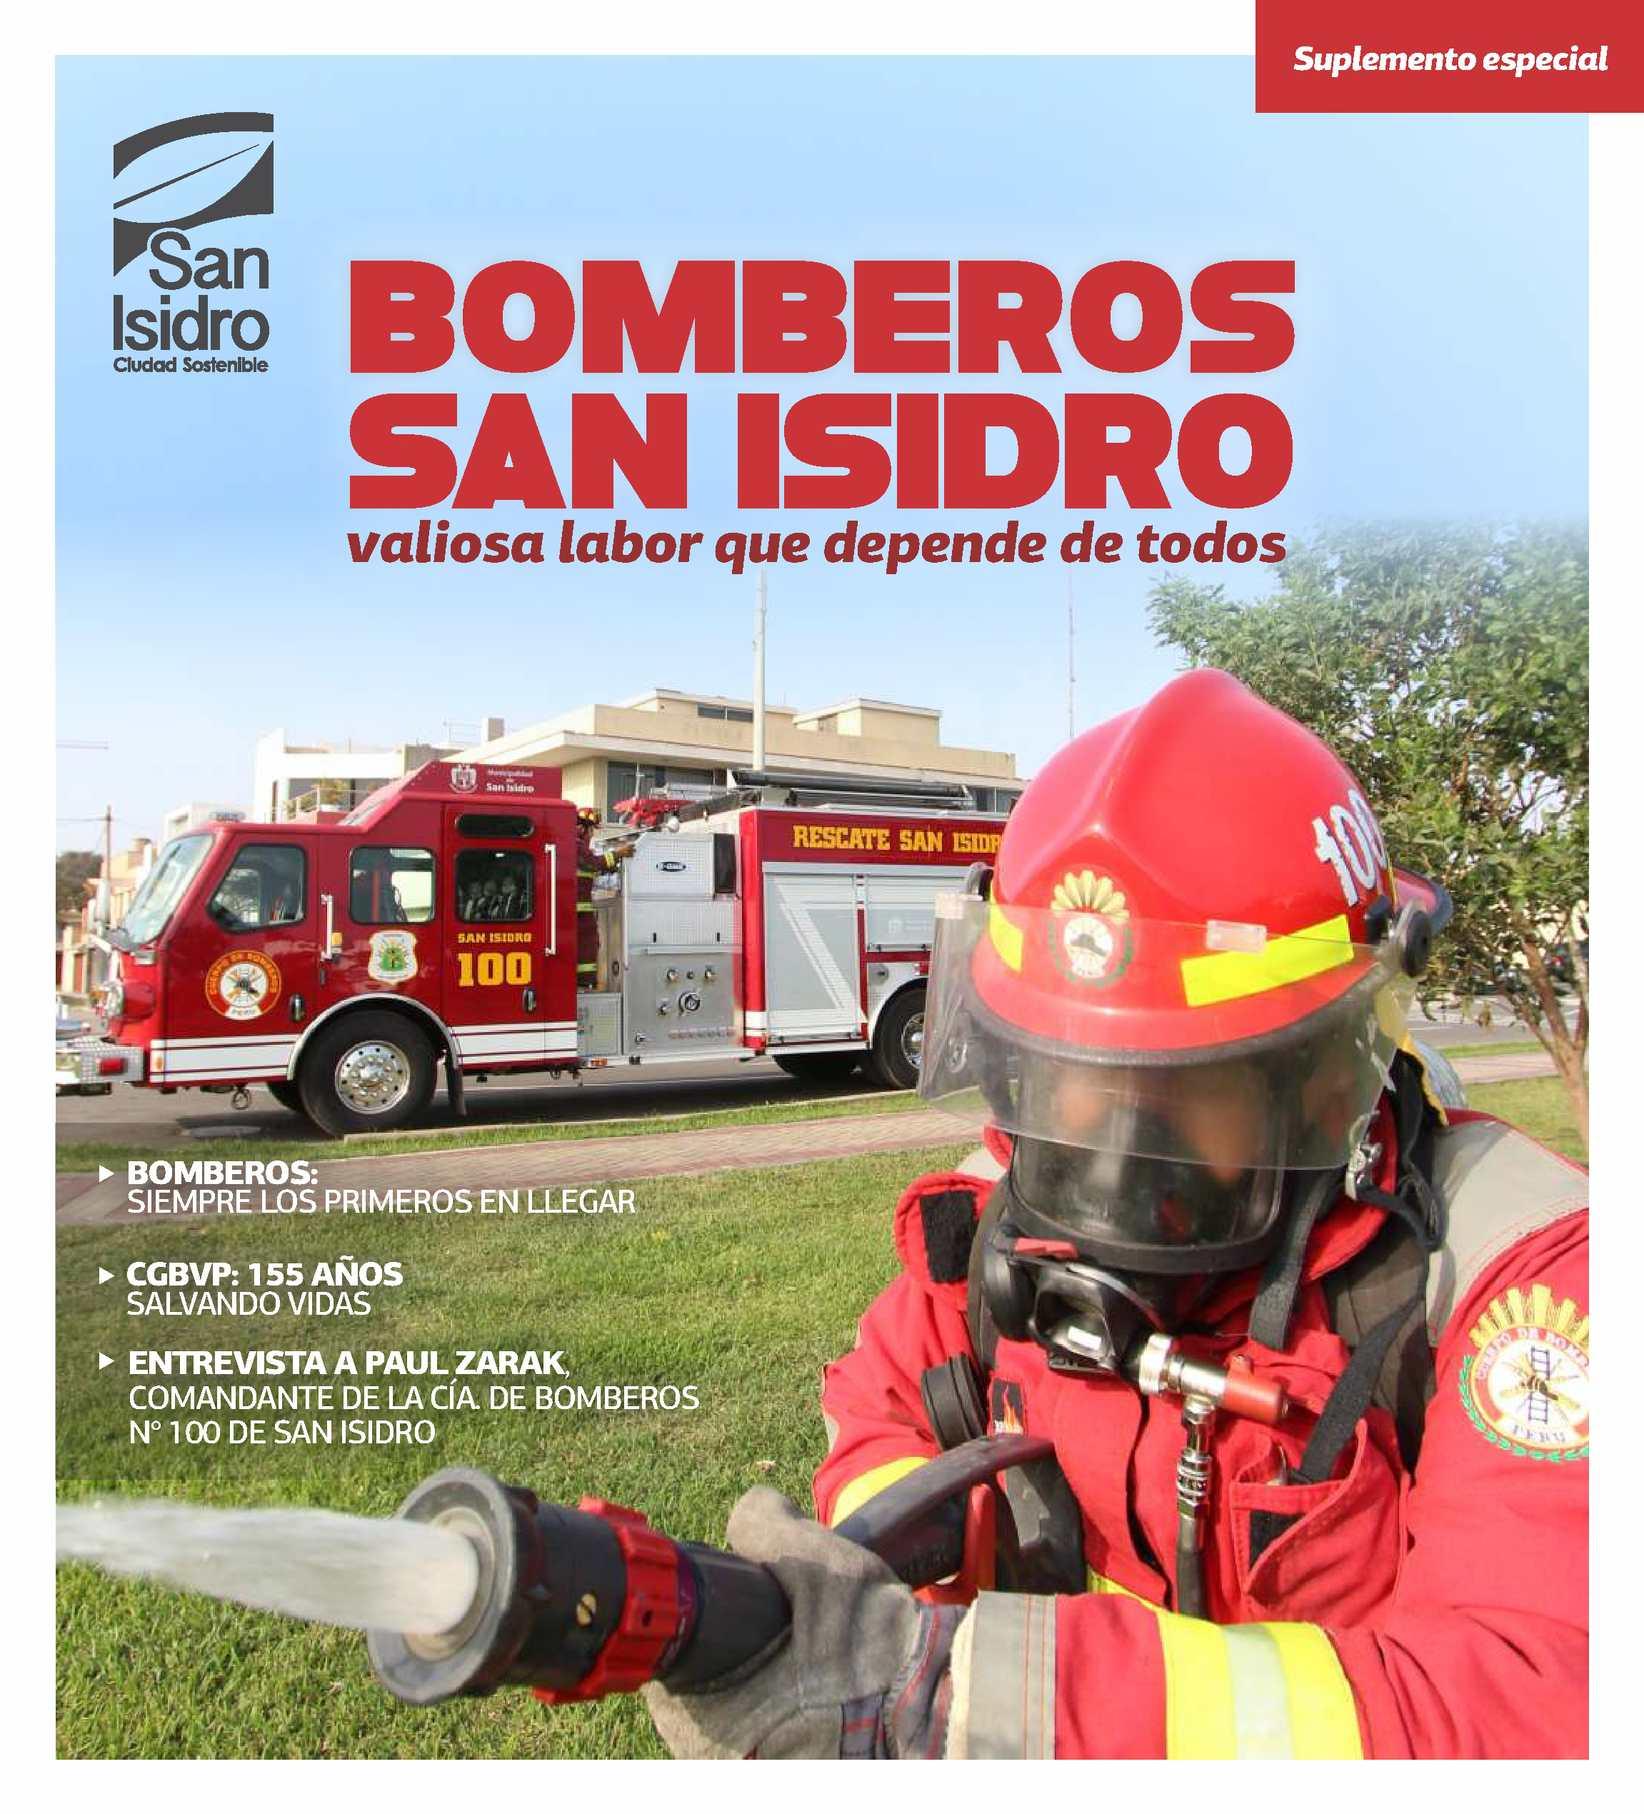 Calaméo - Suplemento El Olivar - Bomberos de San Isidro